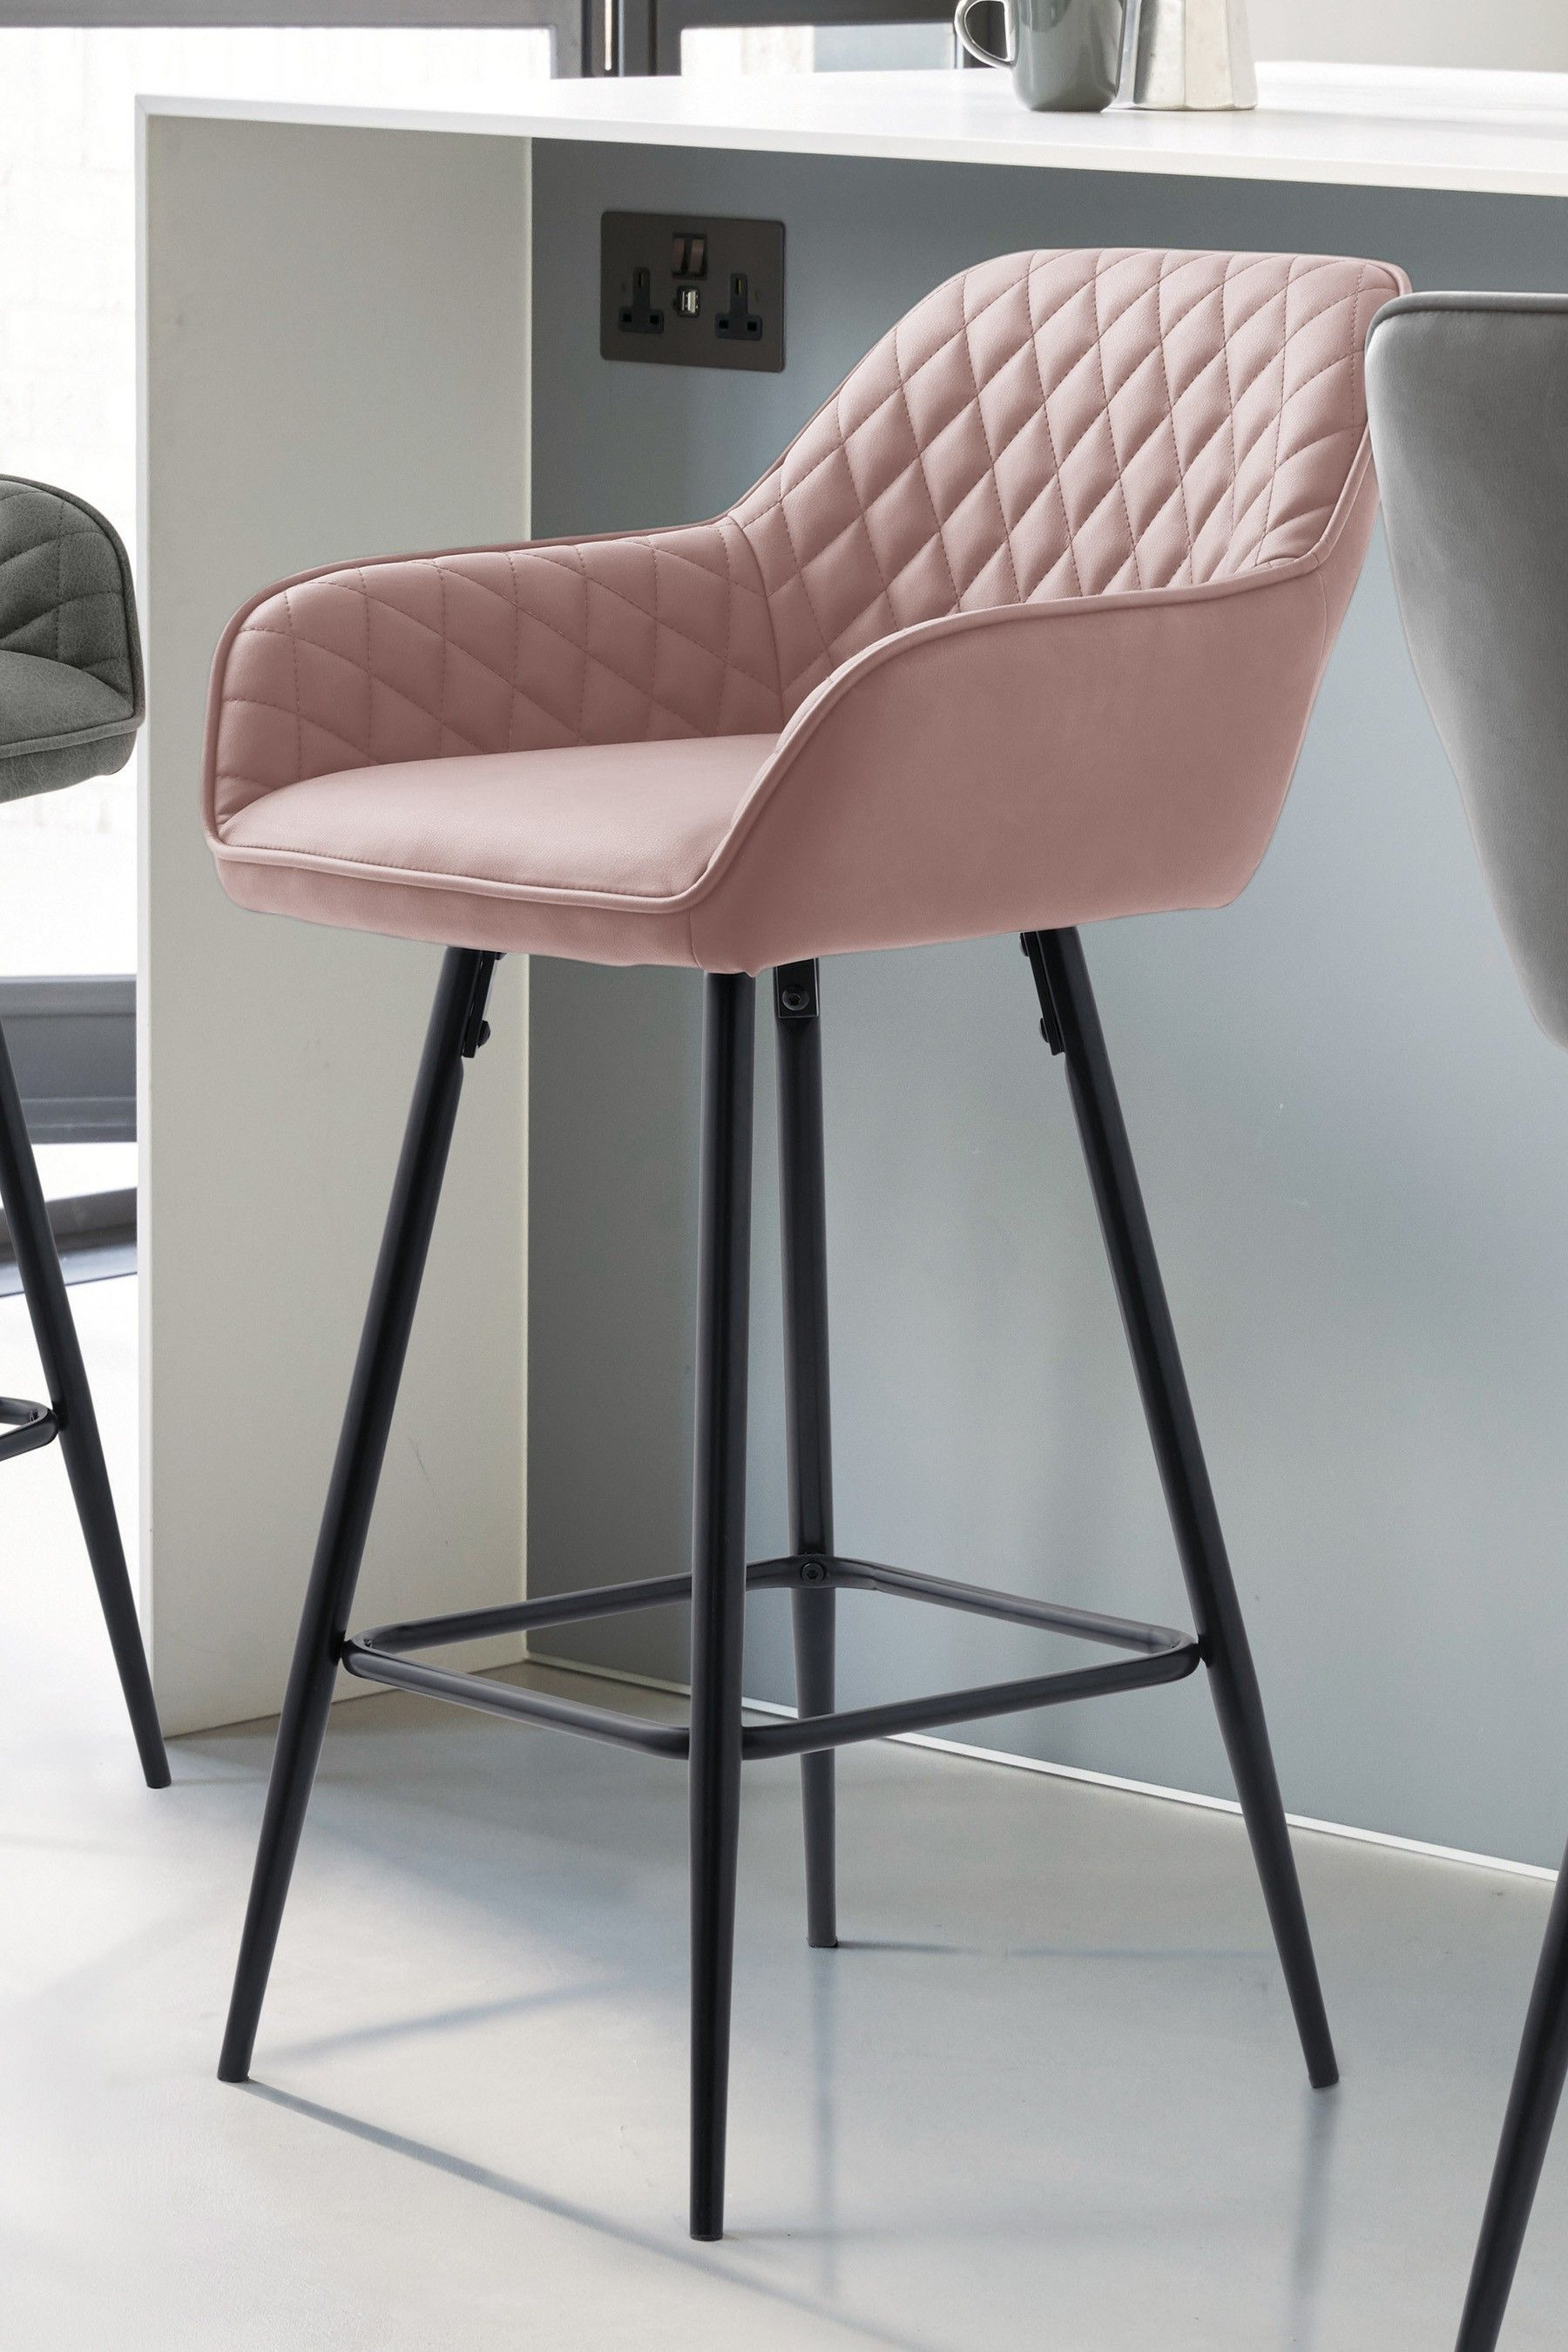 Fantastic Next Hamilton Bar Stool Pink Farmhouse In 2019 Wooden Beatyapartments Chair Design Images Beatyapartmentscom